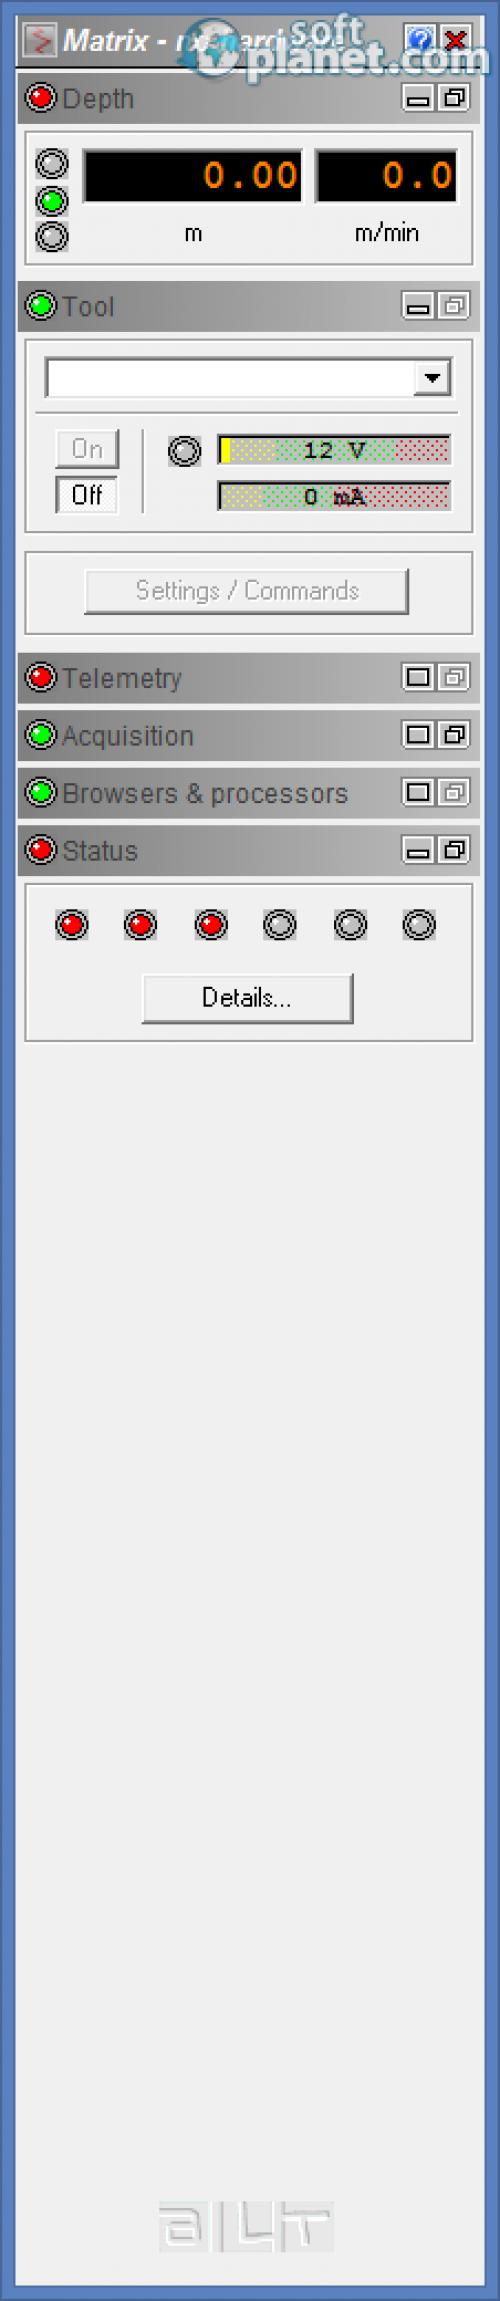 Logger Suite 11.1